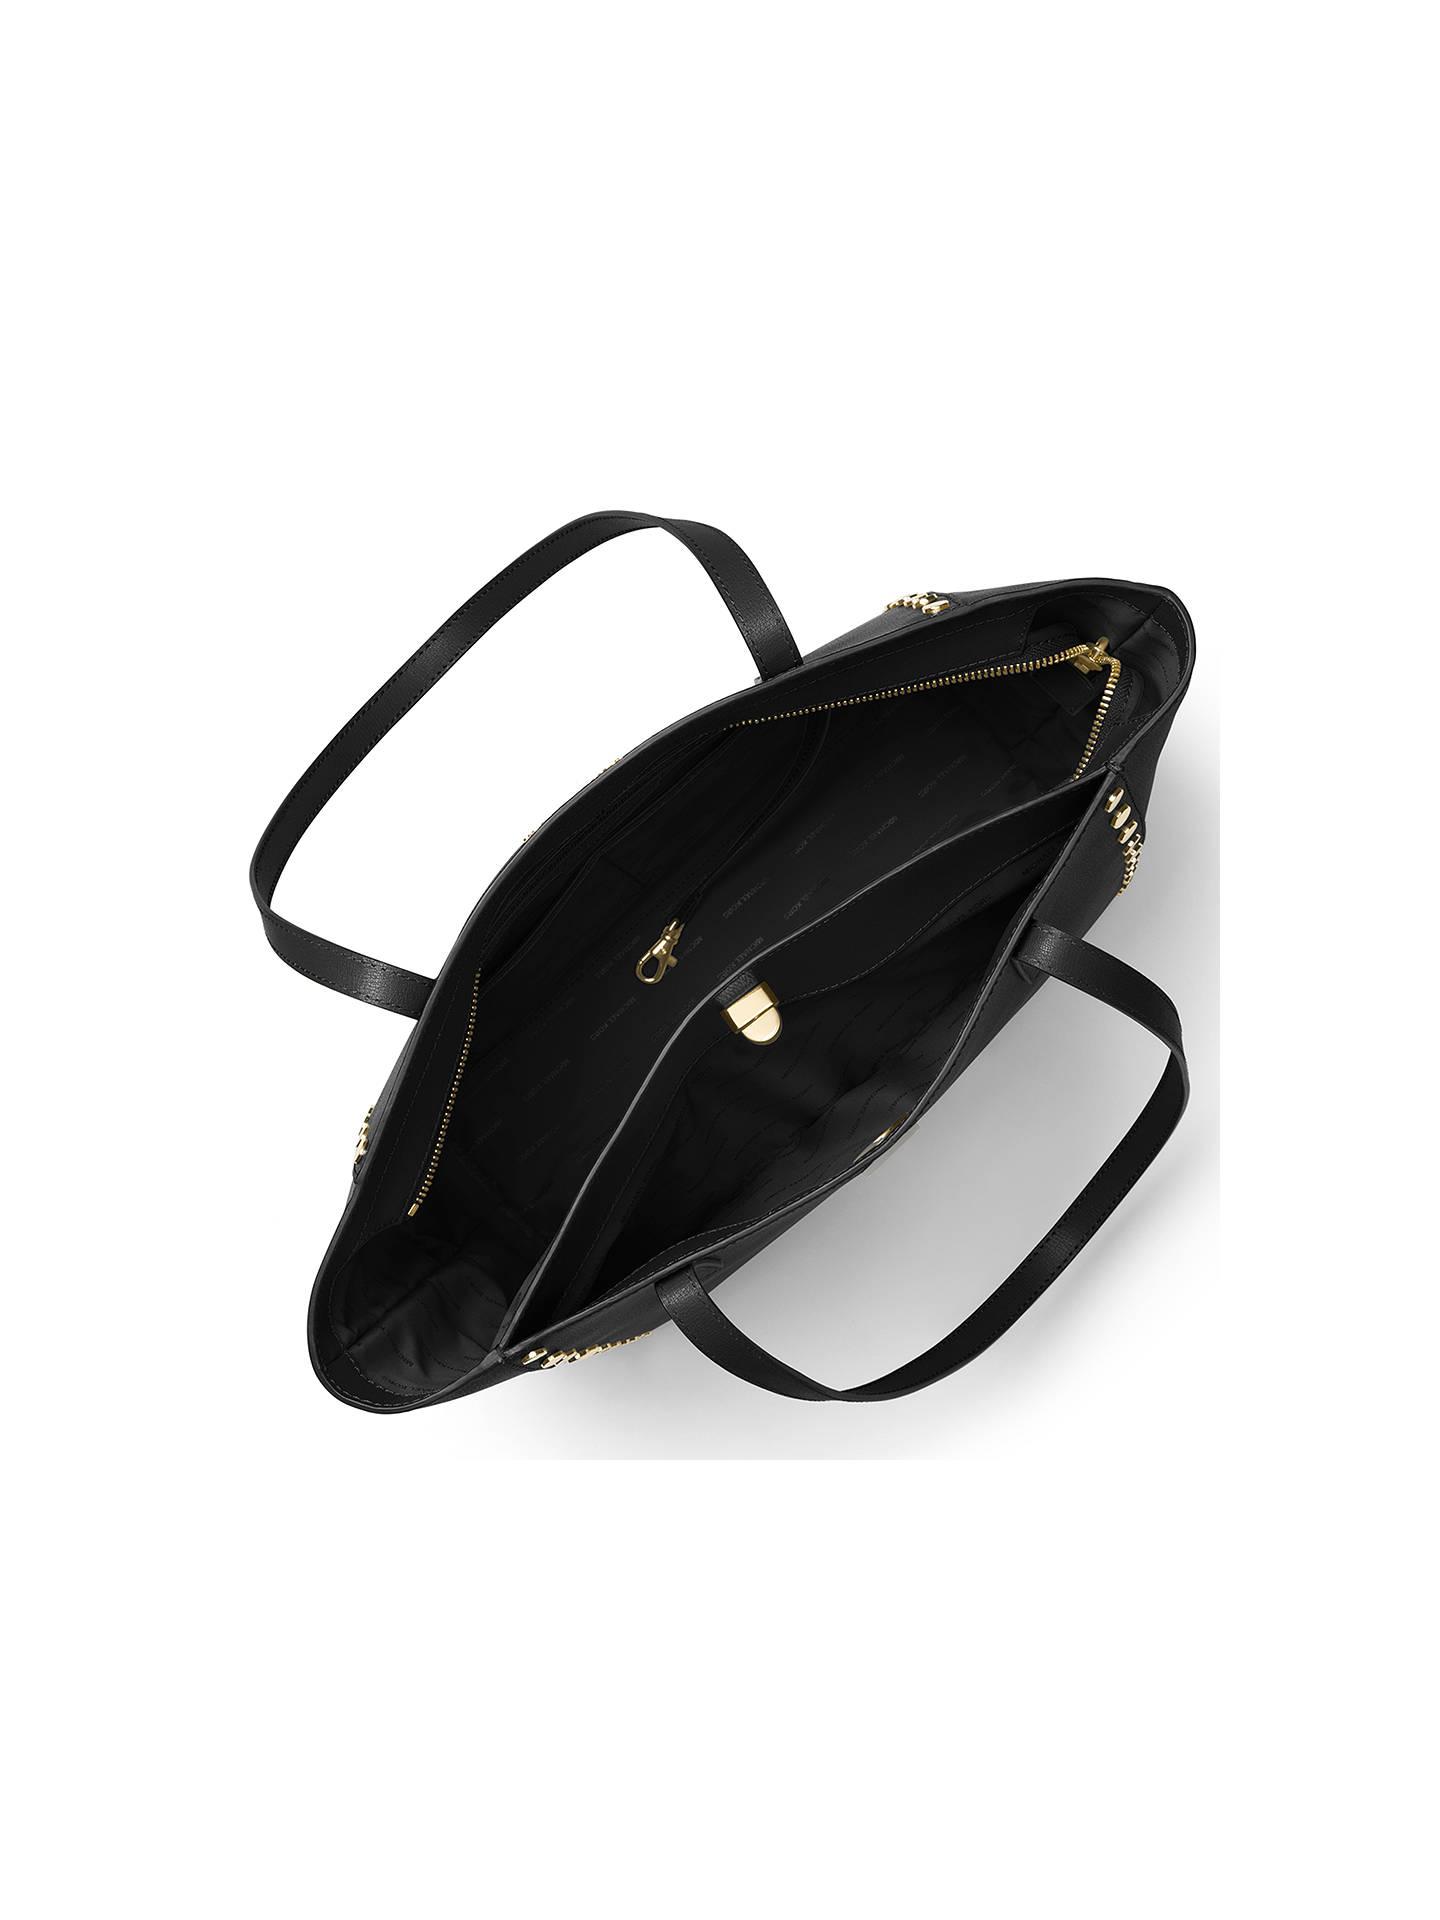 9dc5ec5f12ea Buy MICHAEL Michael Kors Rivington Leather Studded Large Tote Bag, Black  Online at johnlewis.